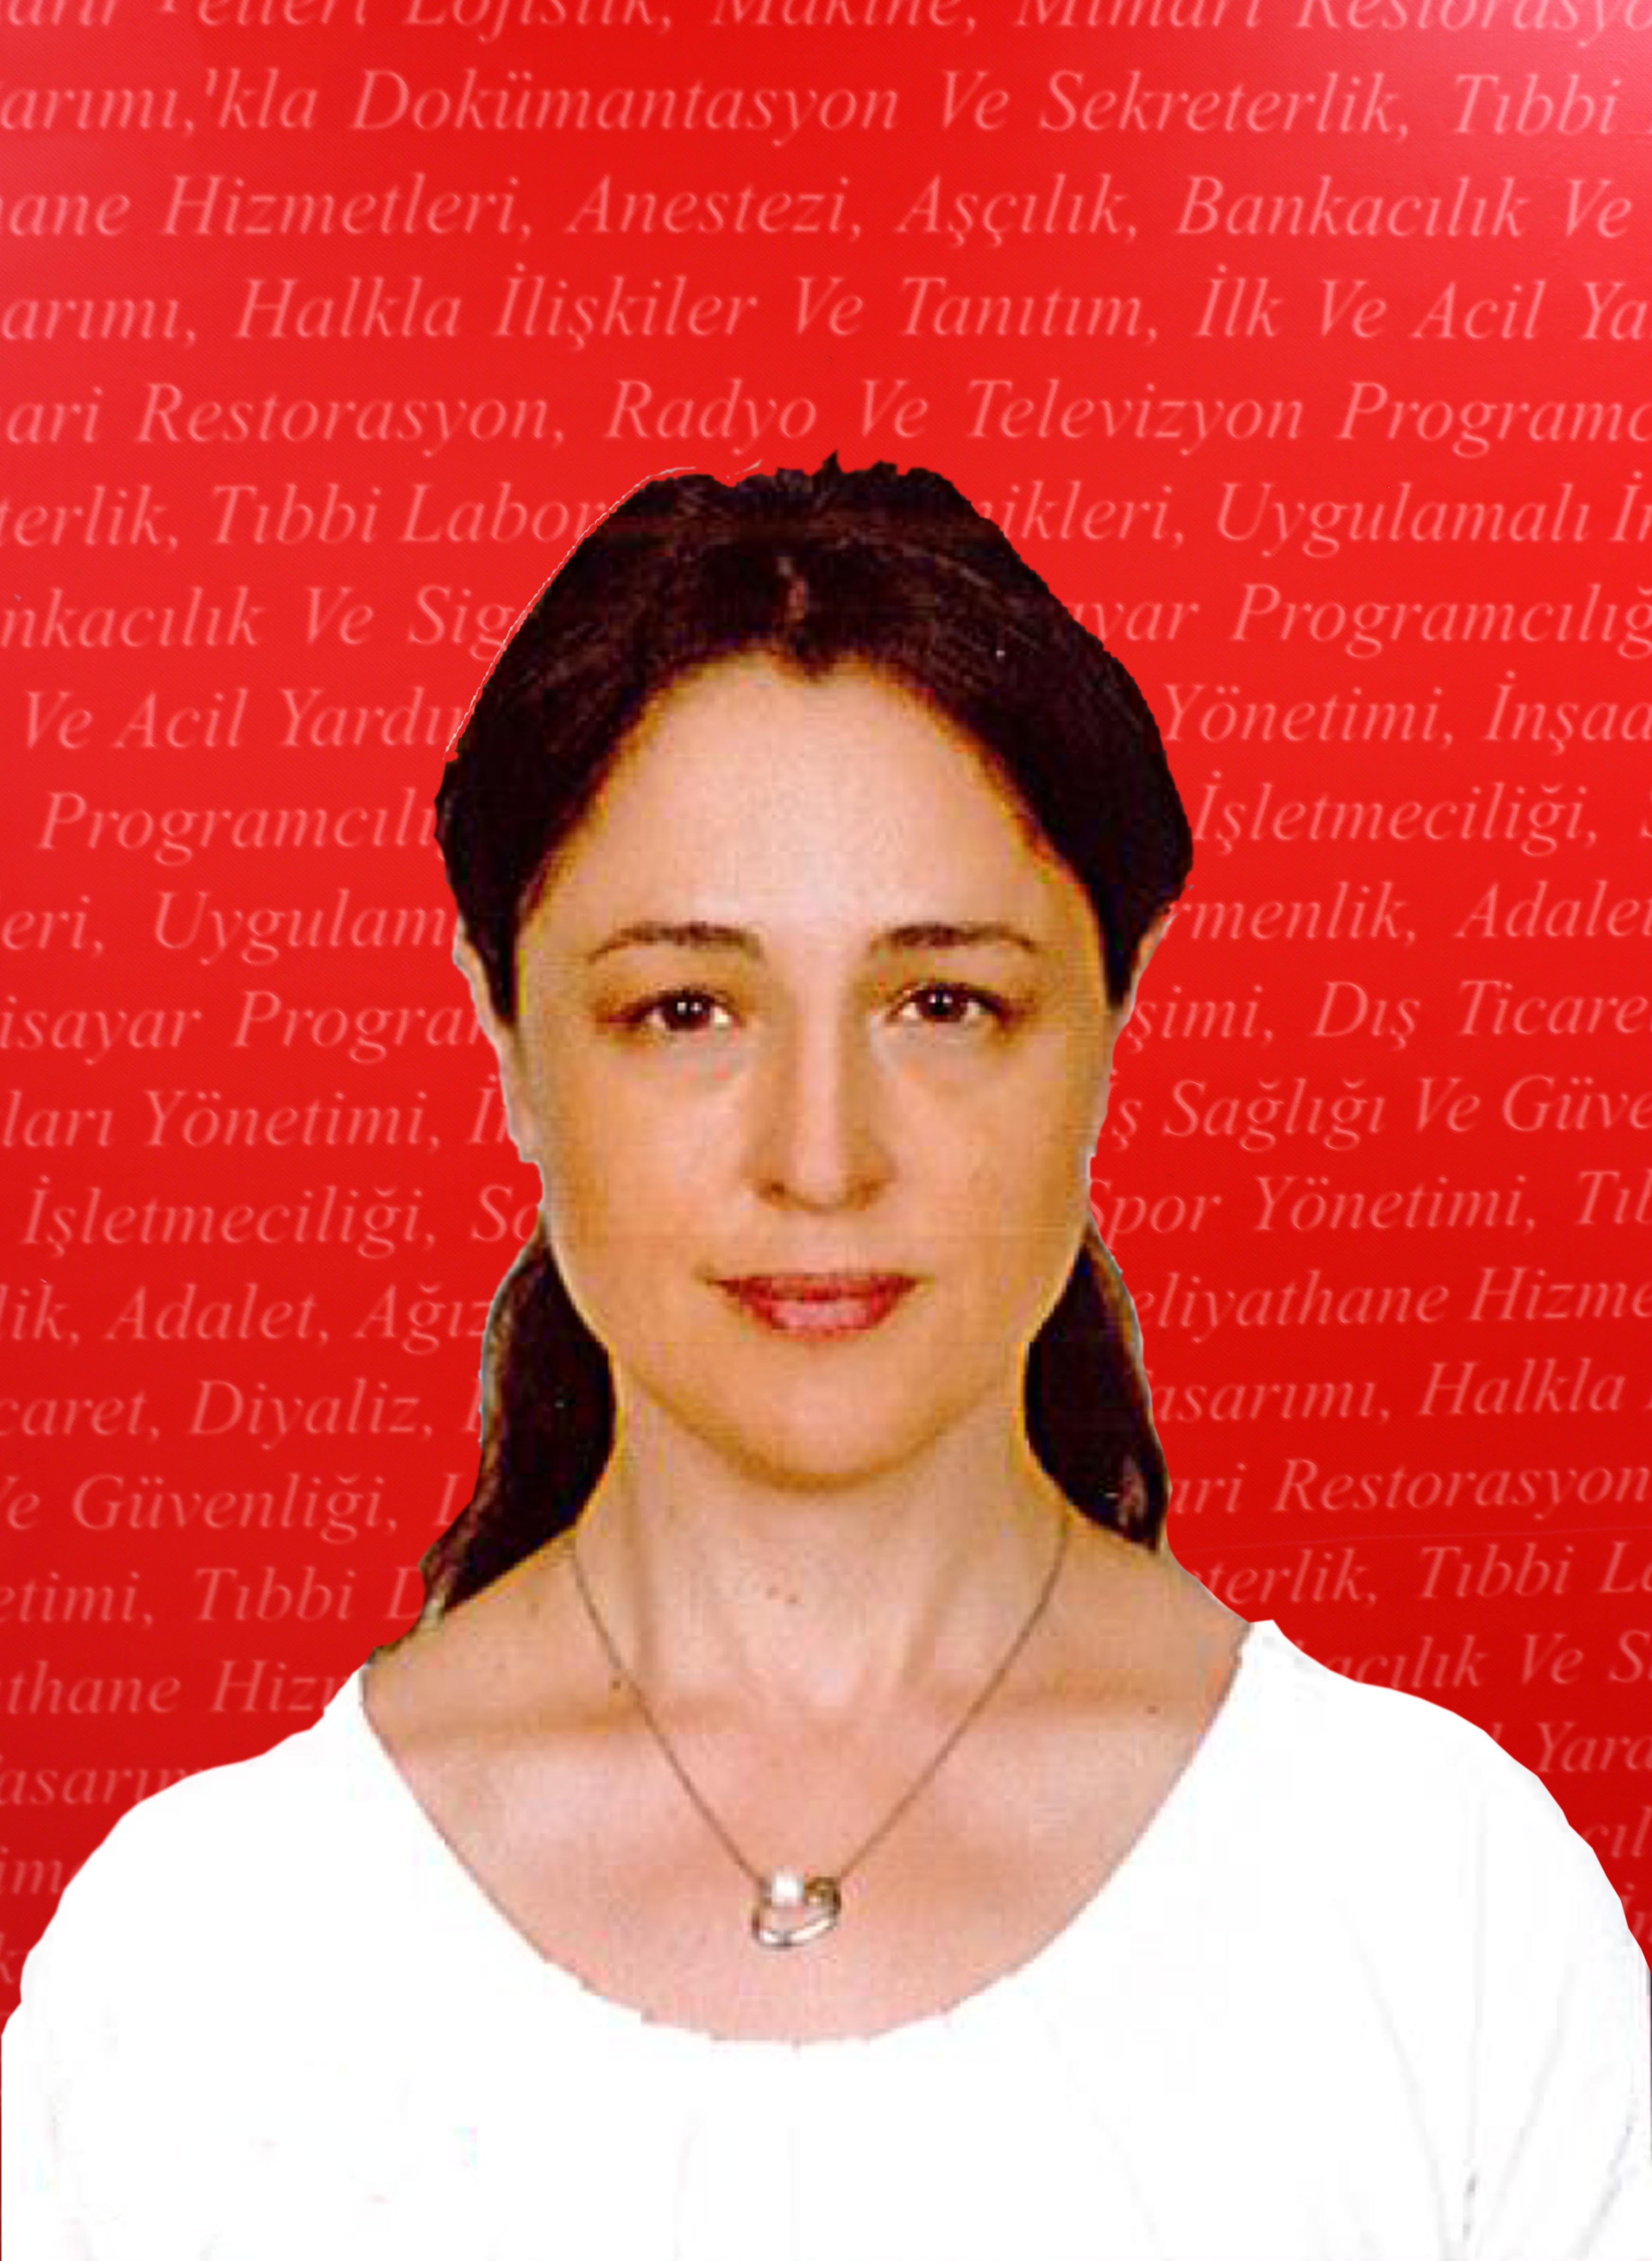 Fatma Burcu Torunoğlu